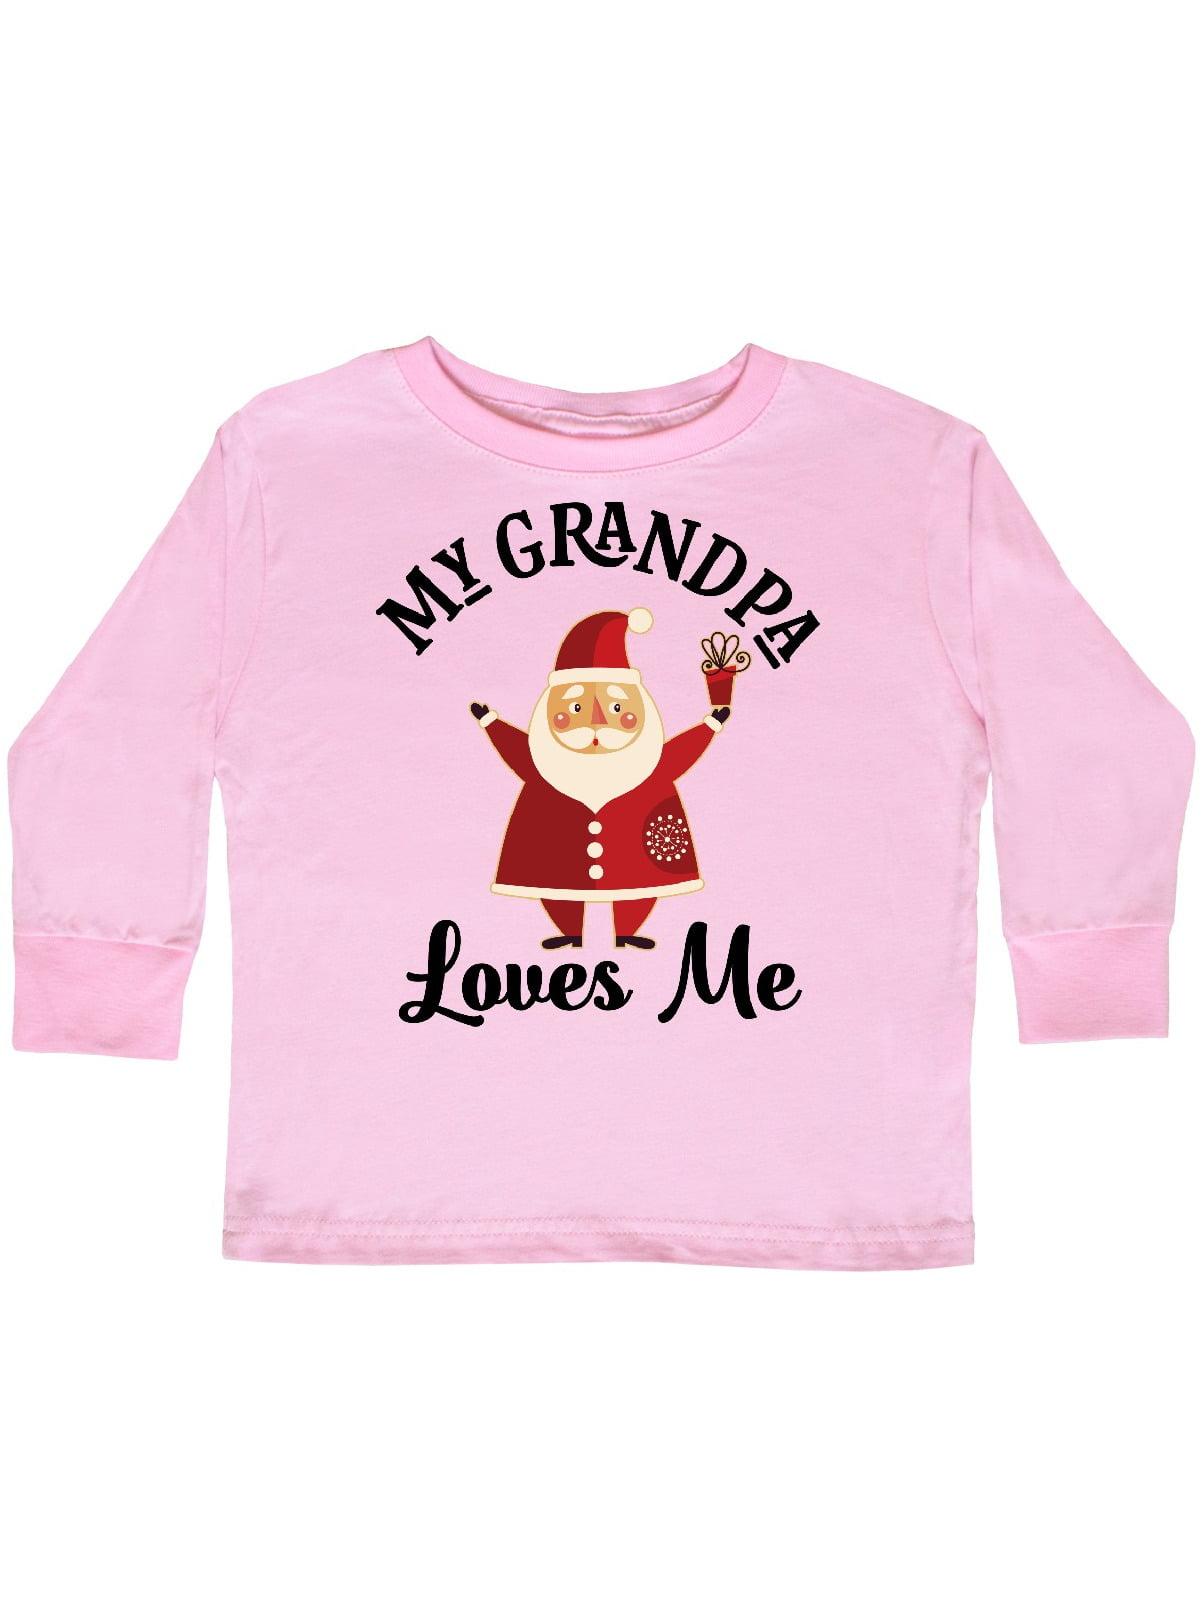 inktastic Grans Big Girl Toddler T-Shirt